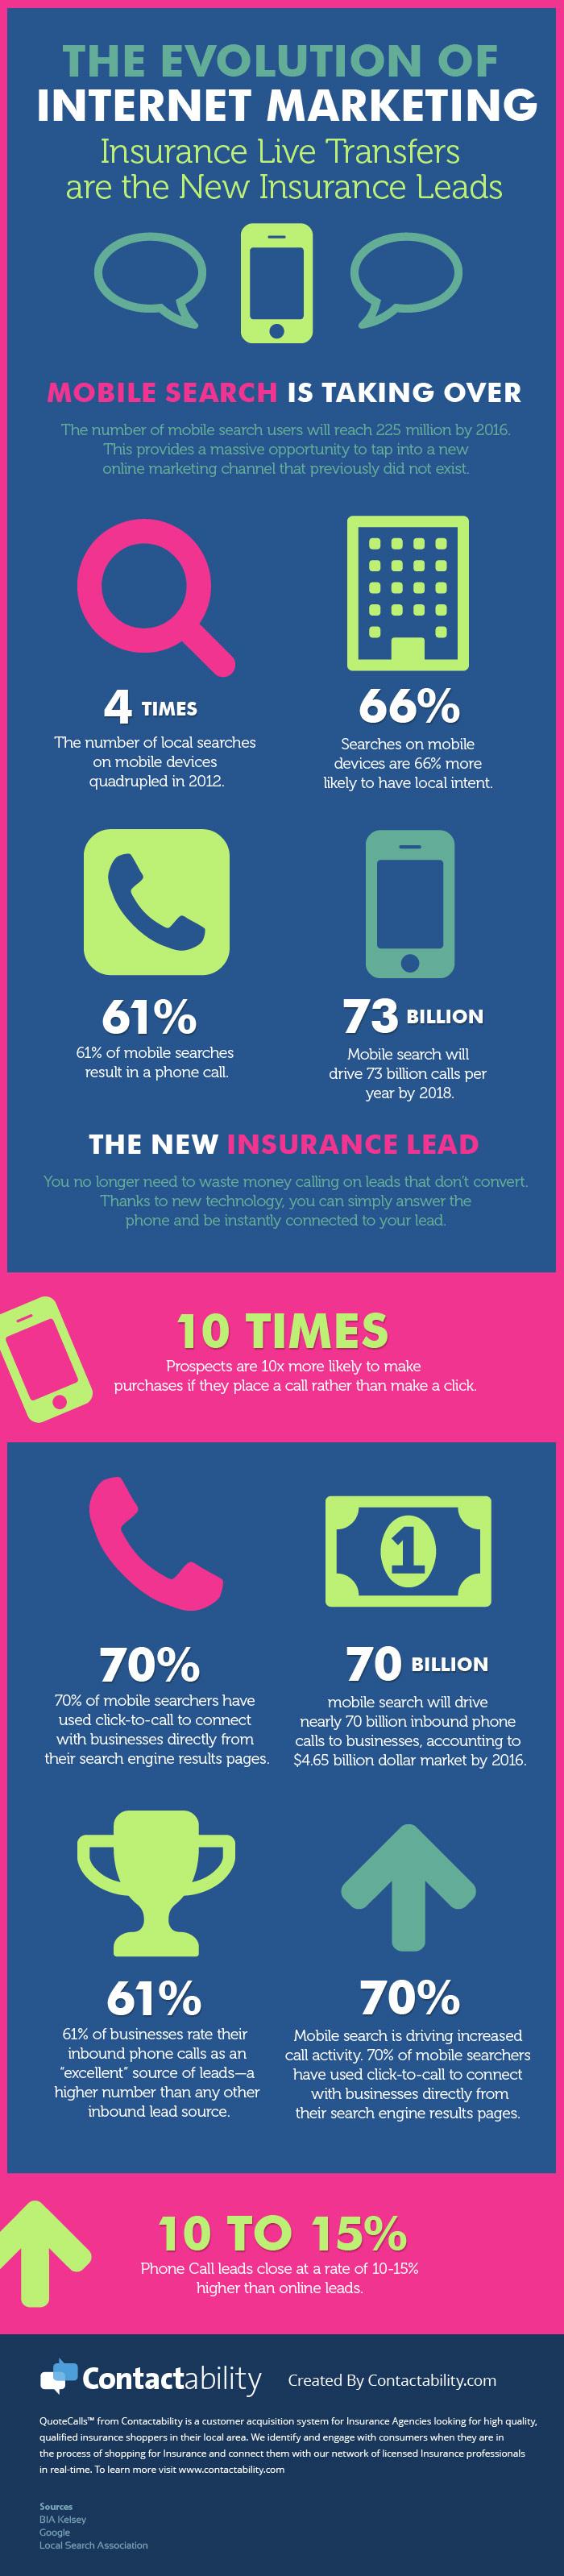 The Evolution of Internet Marketing